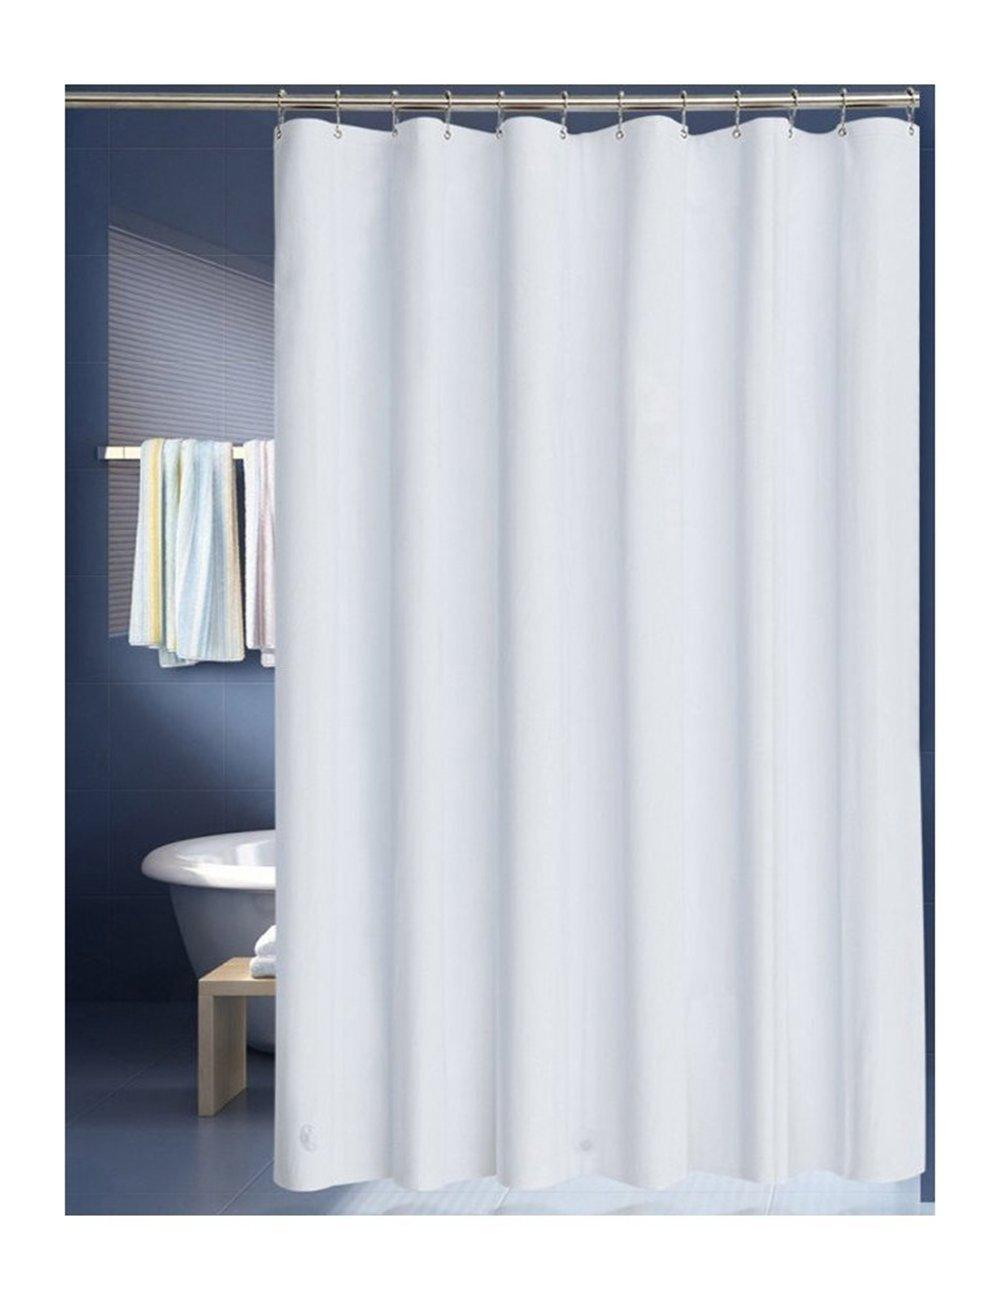 Bath Knbob Shower Curtain Hooks Flower Pattern Shower